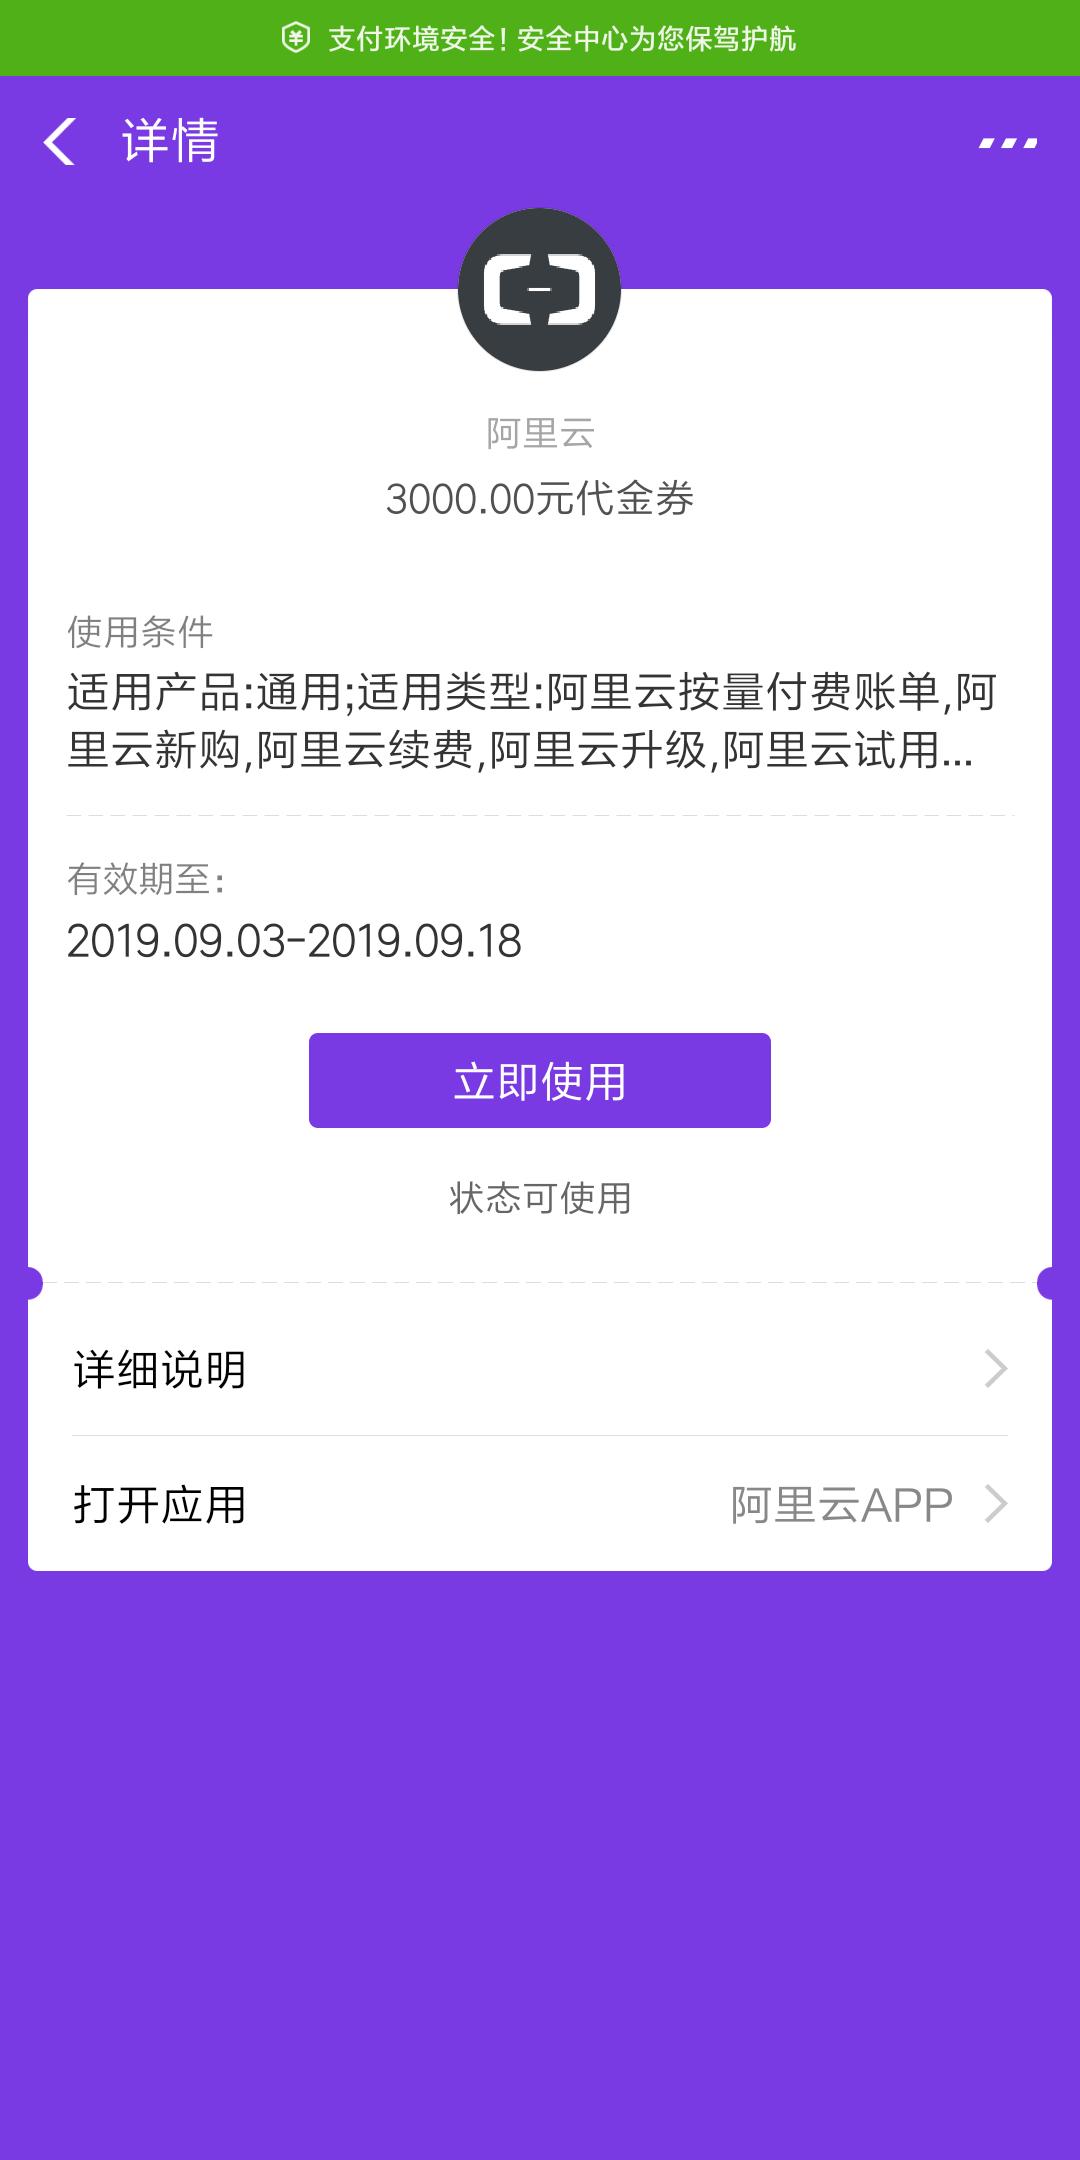 Screenshot_2019-09-03-18-28-09-620_com.eg.android.AlipayGphone.png